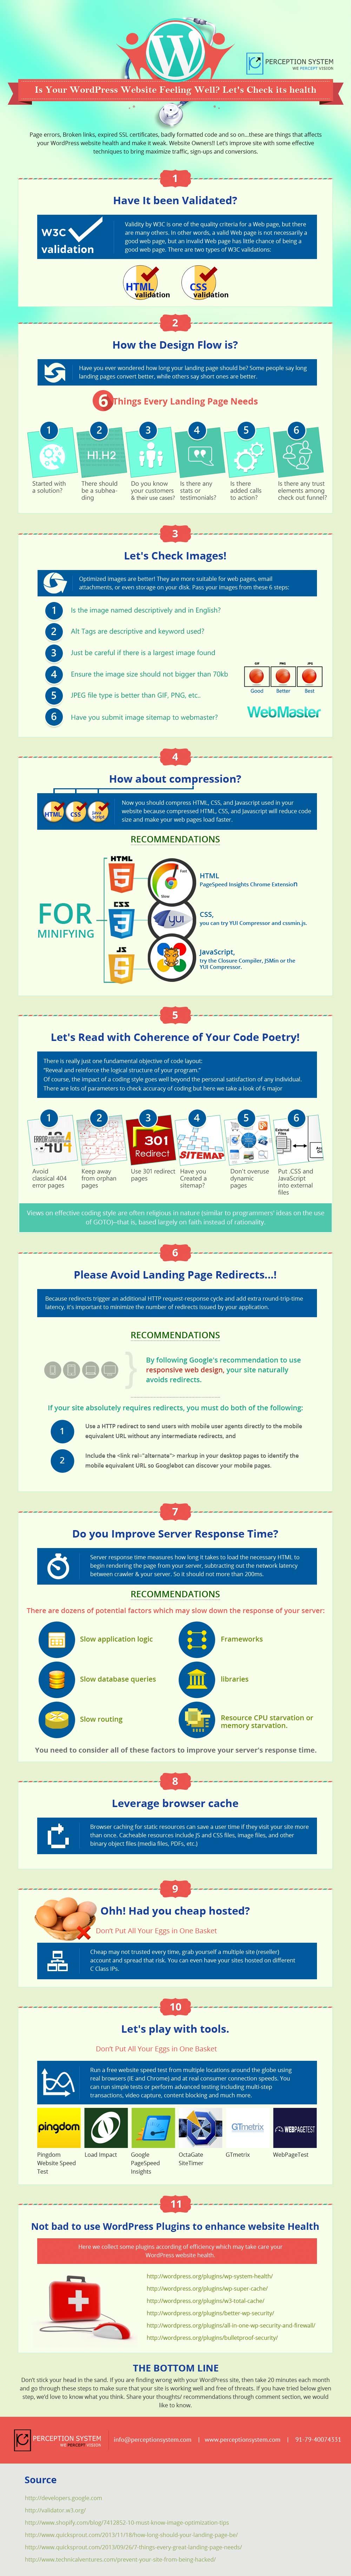 Wordpress Site Health Facts